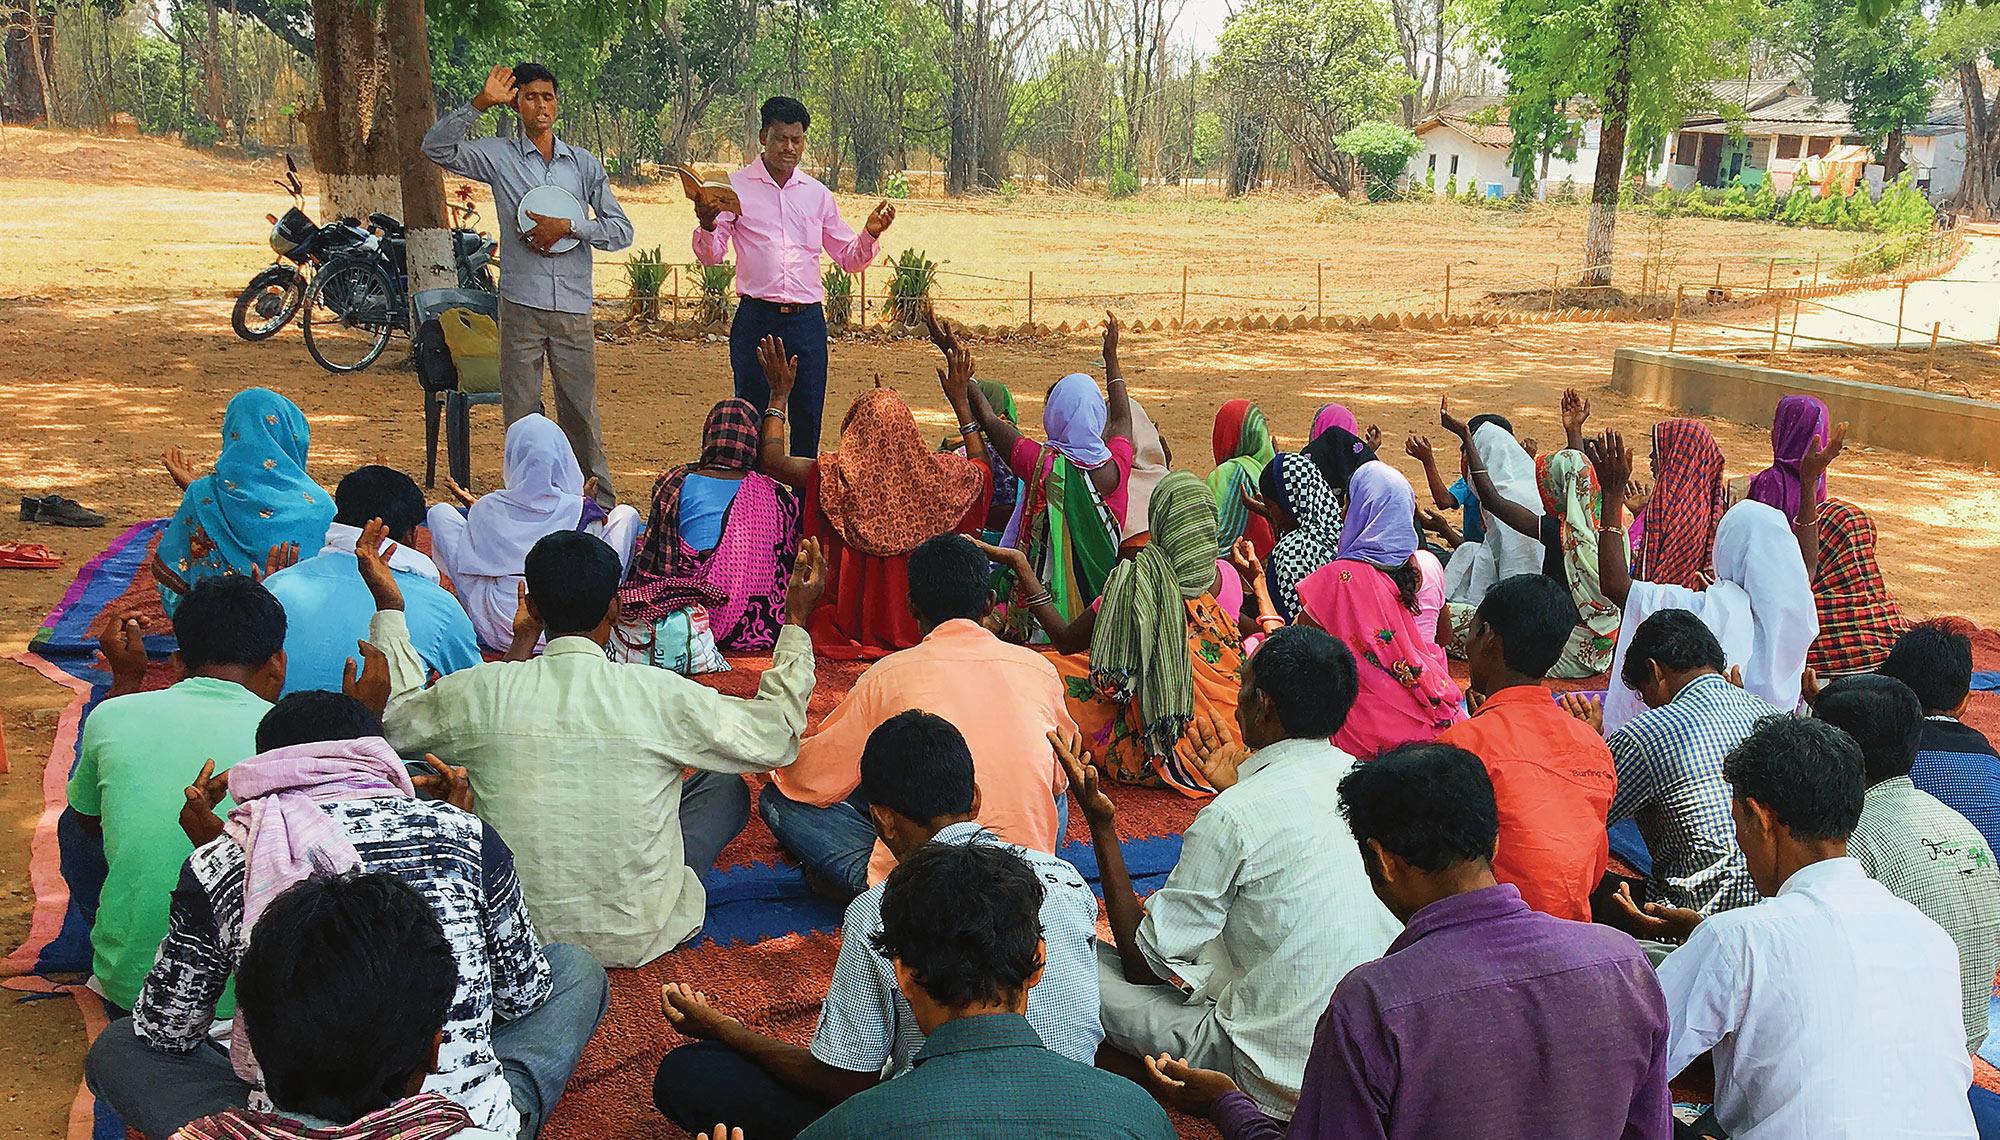 Group listening to speaker preaching